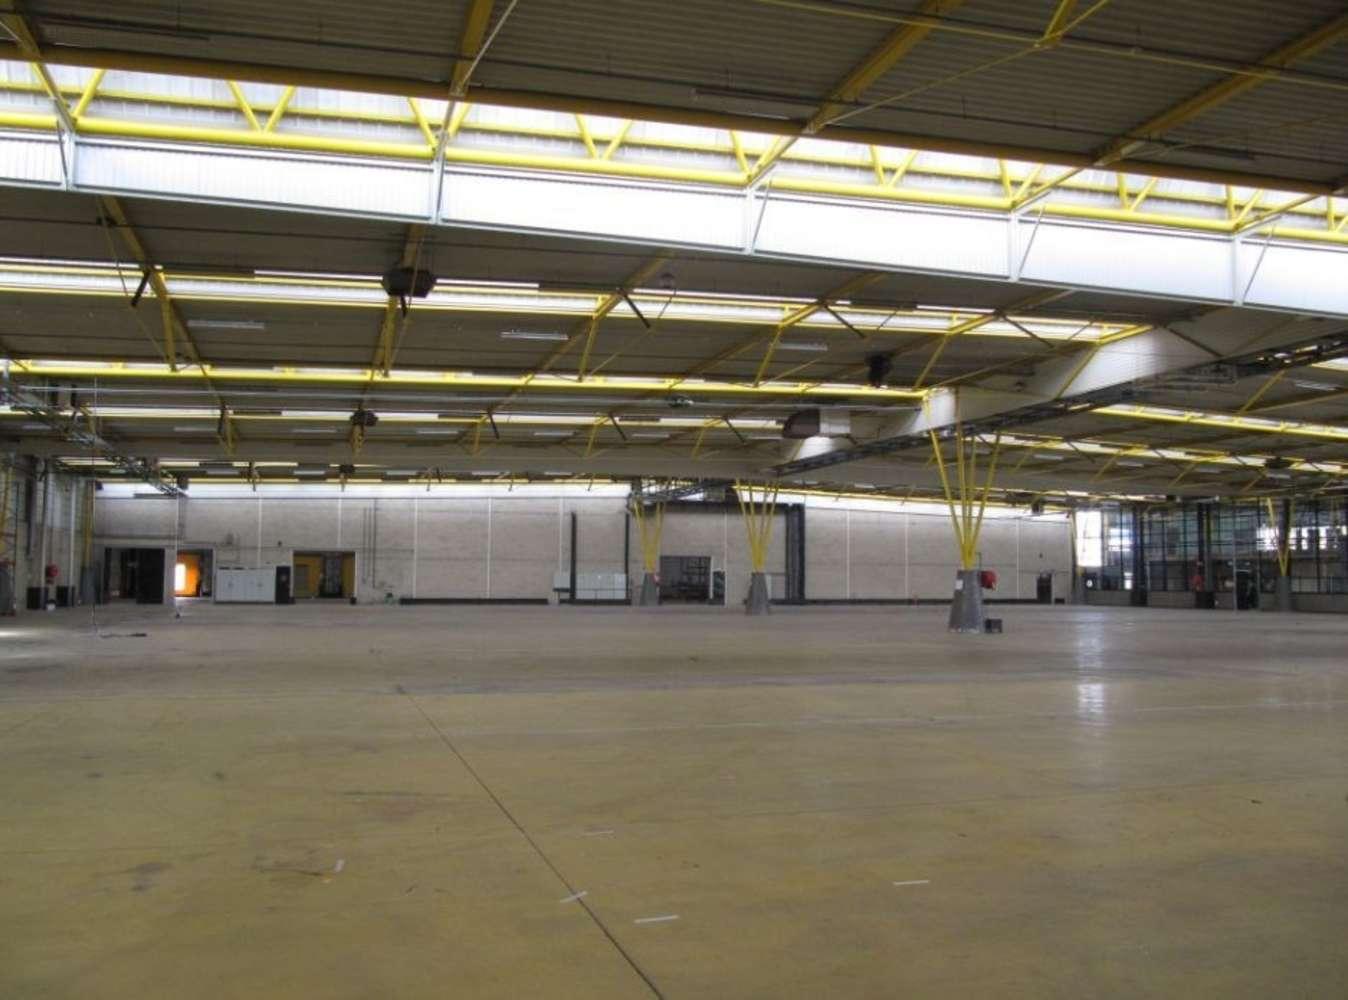 Activités/entrepôt Roissy en france, 95700 - 4 RUE DE LA PRESSE - 9449798